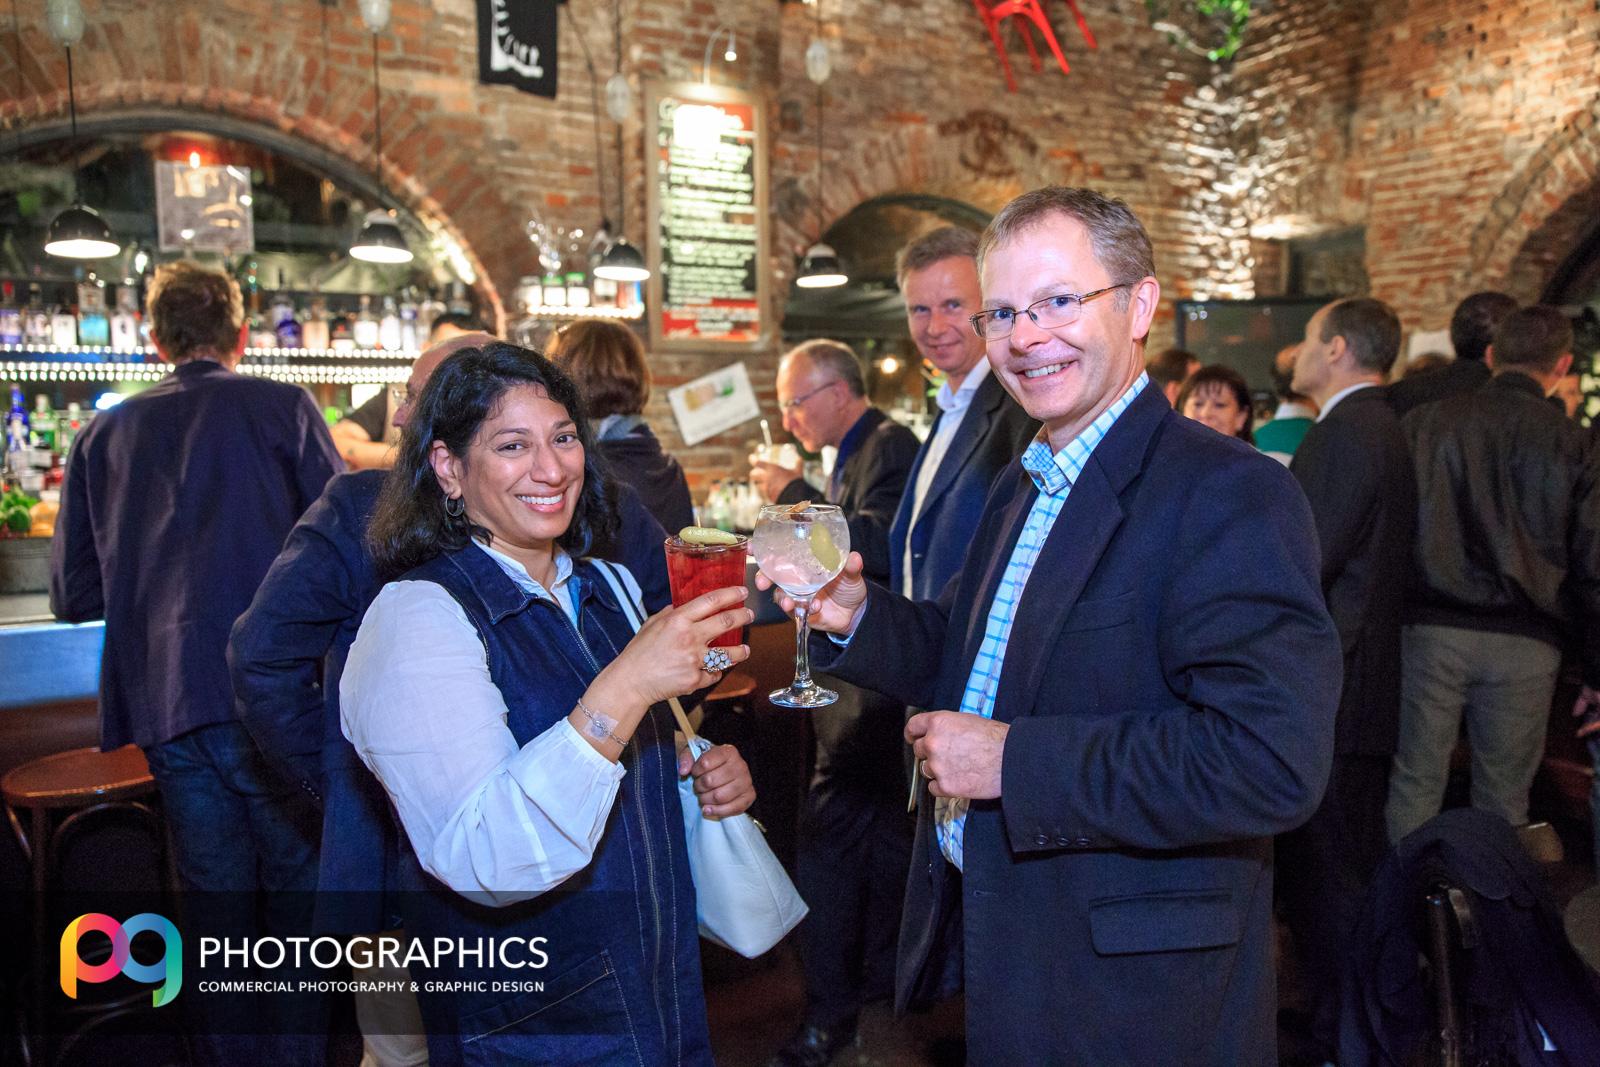 ESCR-2018-conference-event-photography-UK-glasgow-edinburgh-25.jpg